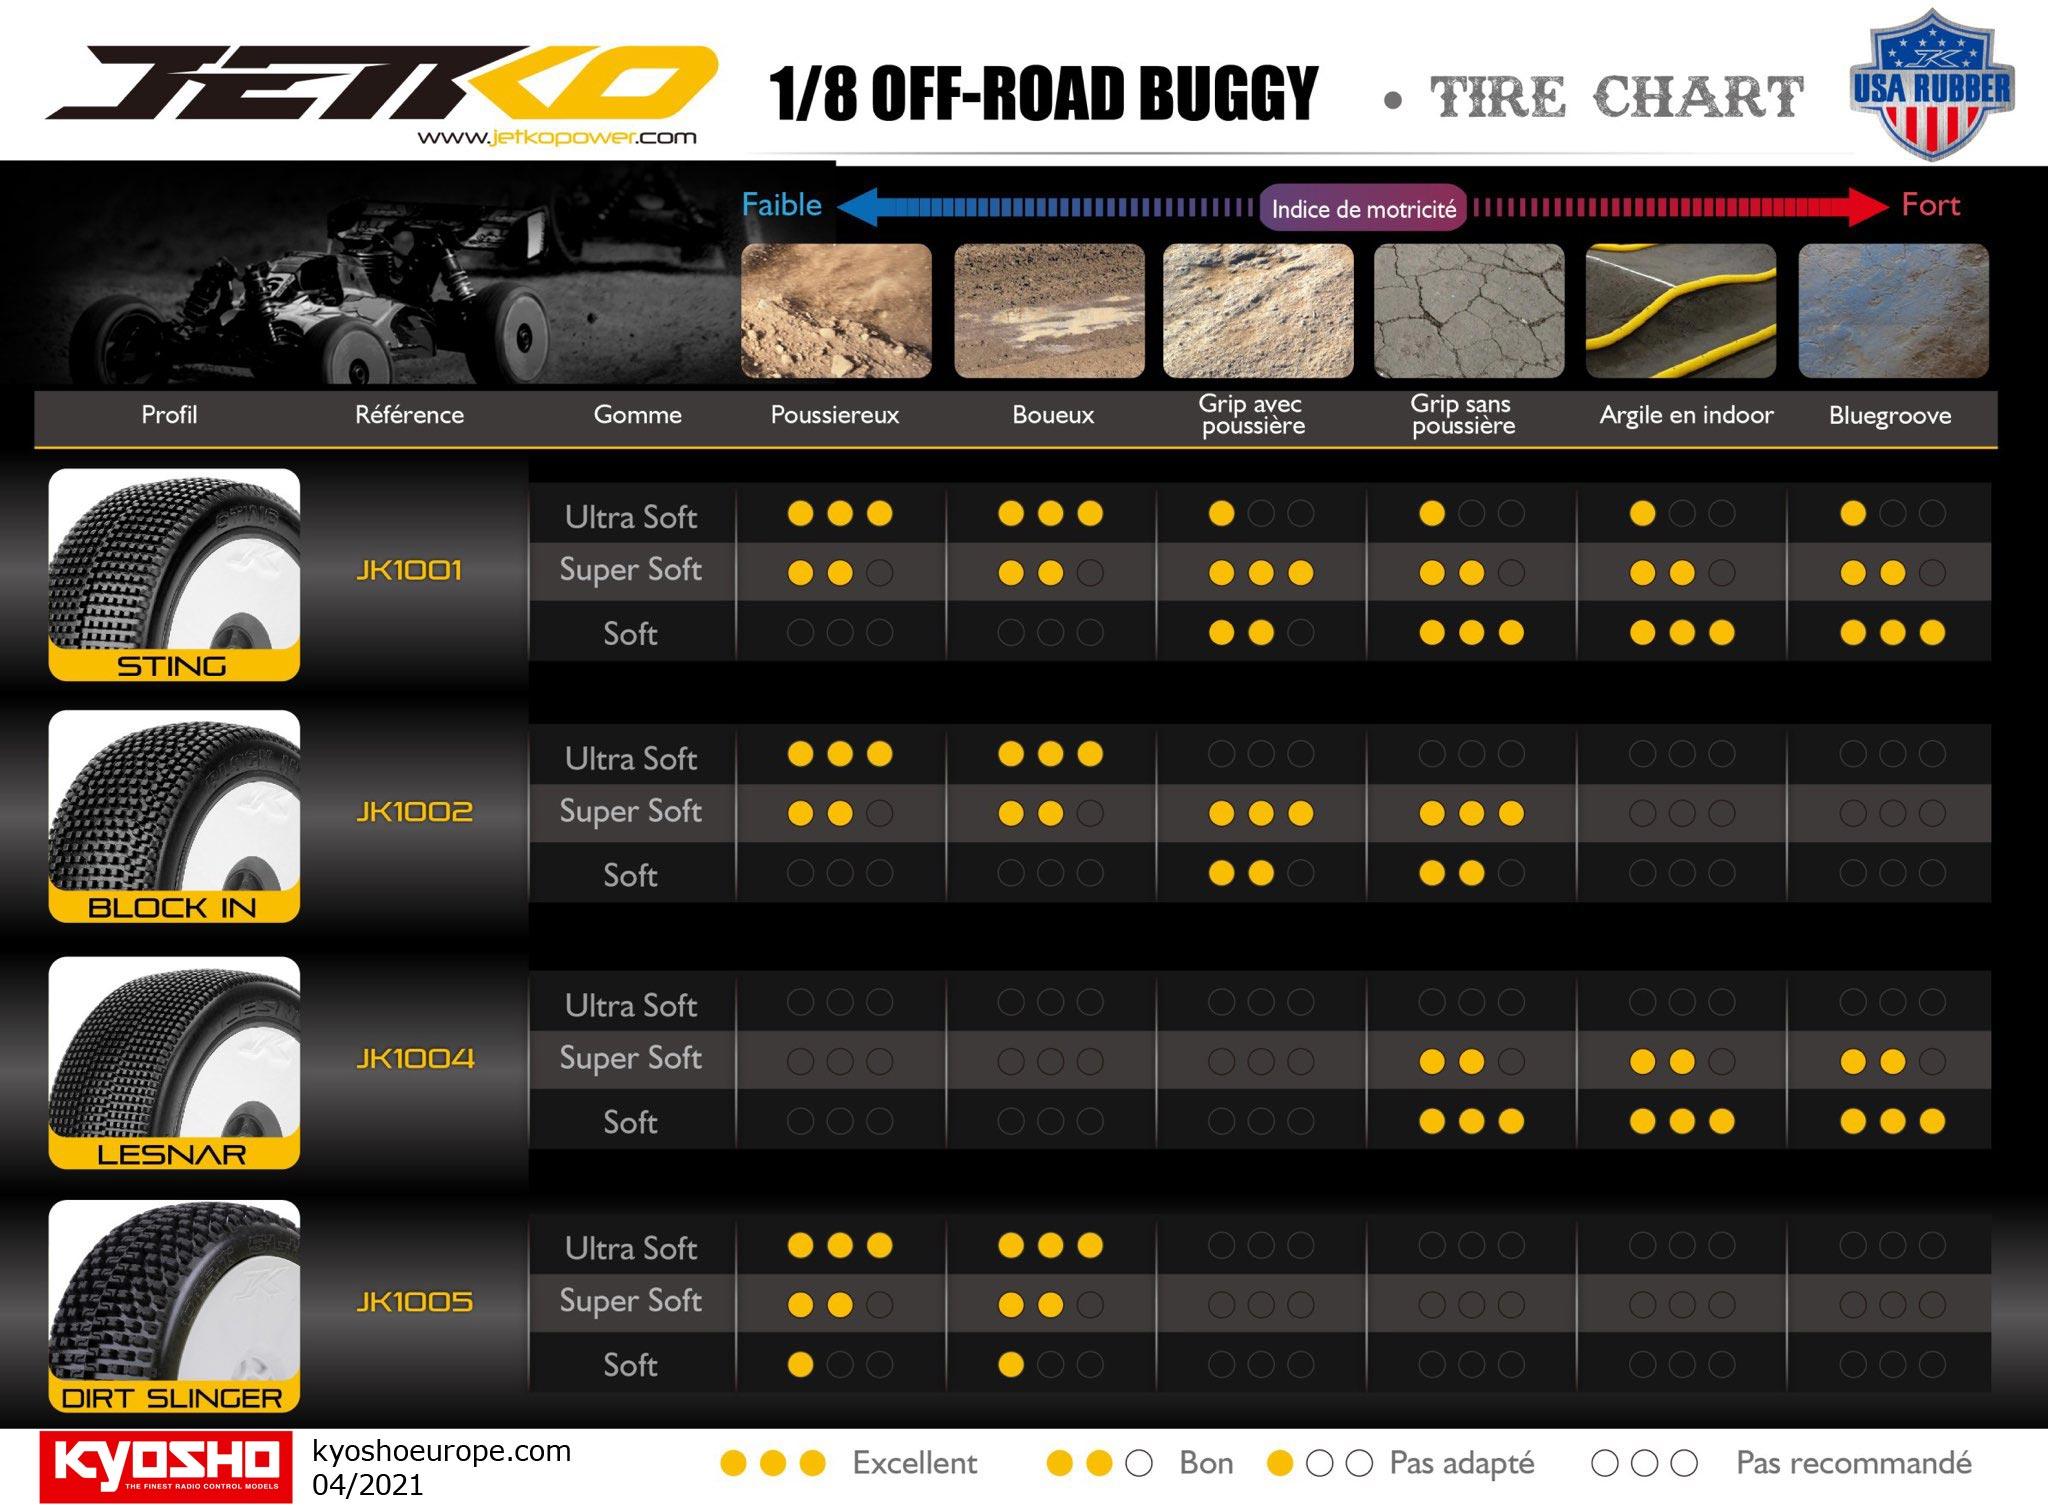 Tableau d'utilisation des pneus Jetko